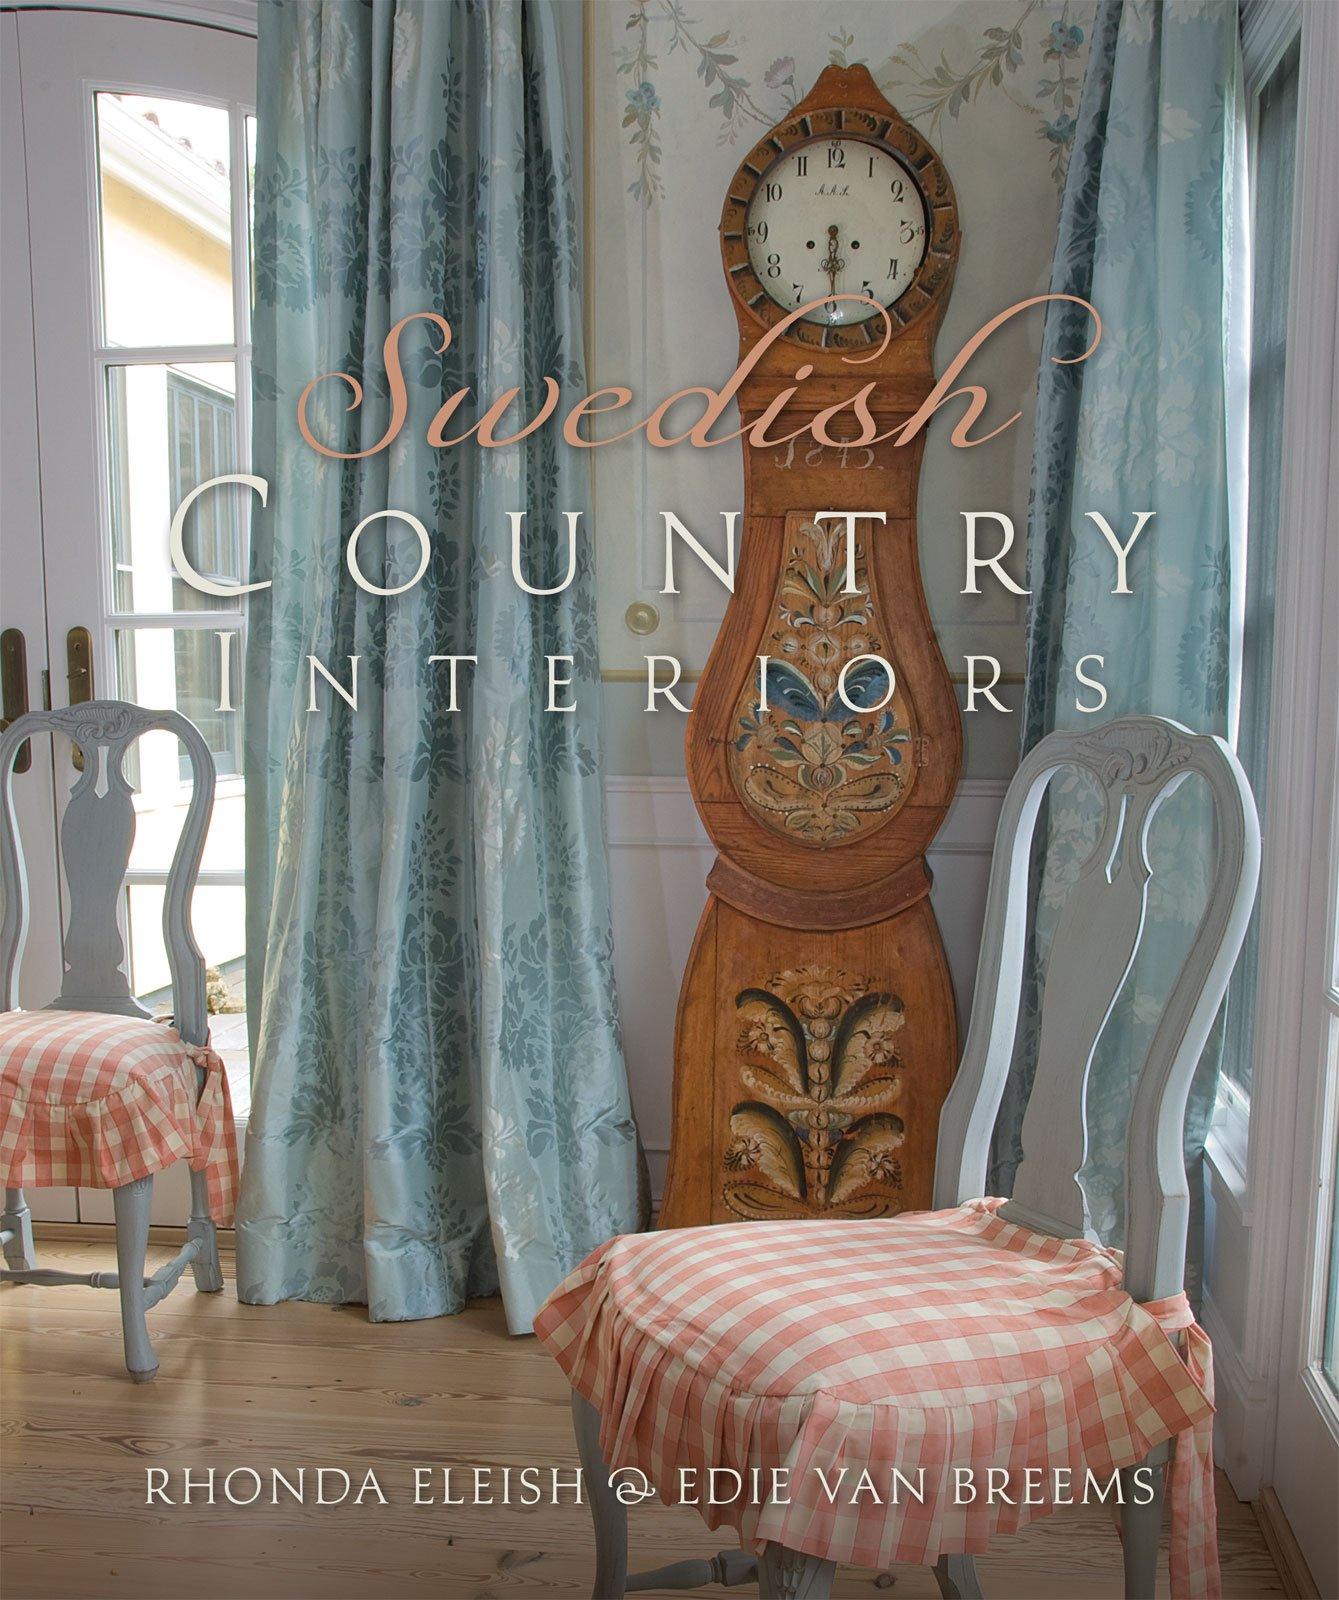 Swedish Country Interiors: Rhonda Eleish, Edie Van Breems: 9781423604426:  Amazon.com: Books